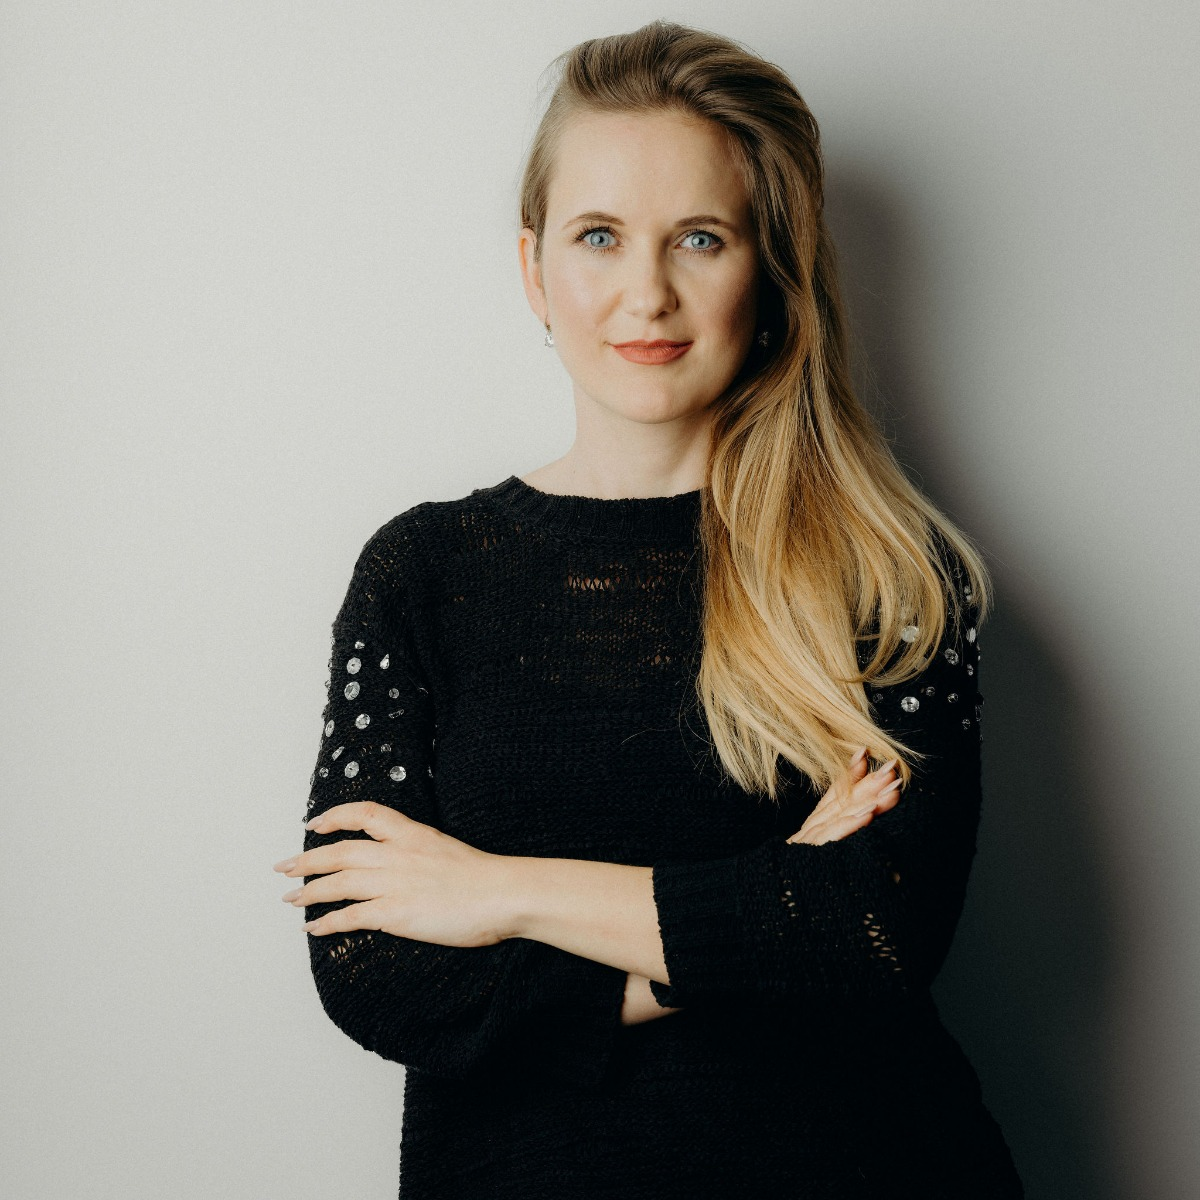 Kristyna Janalikova